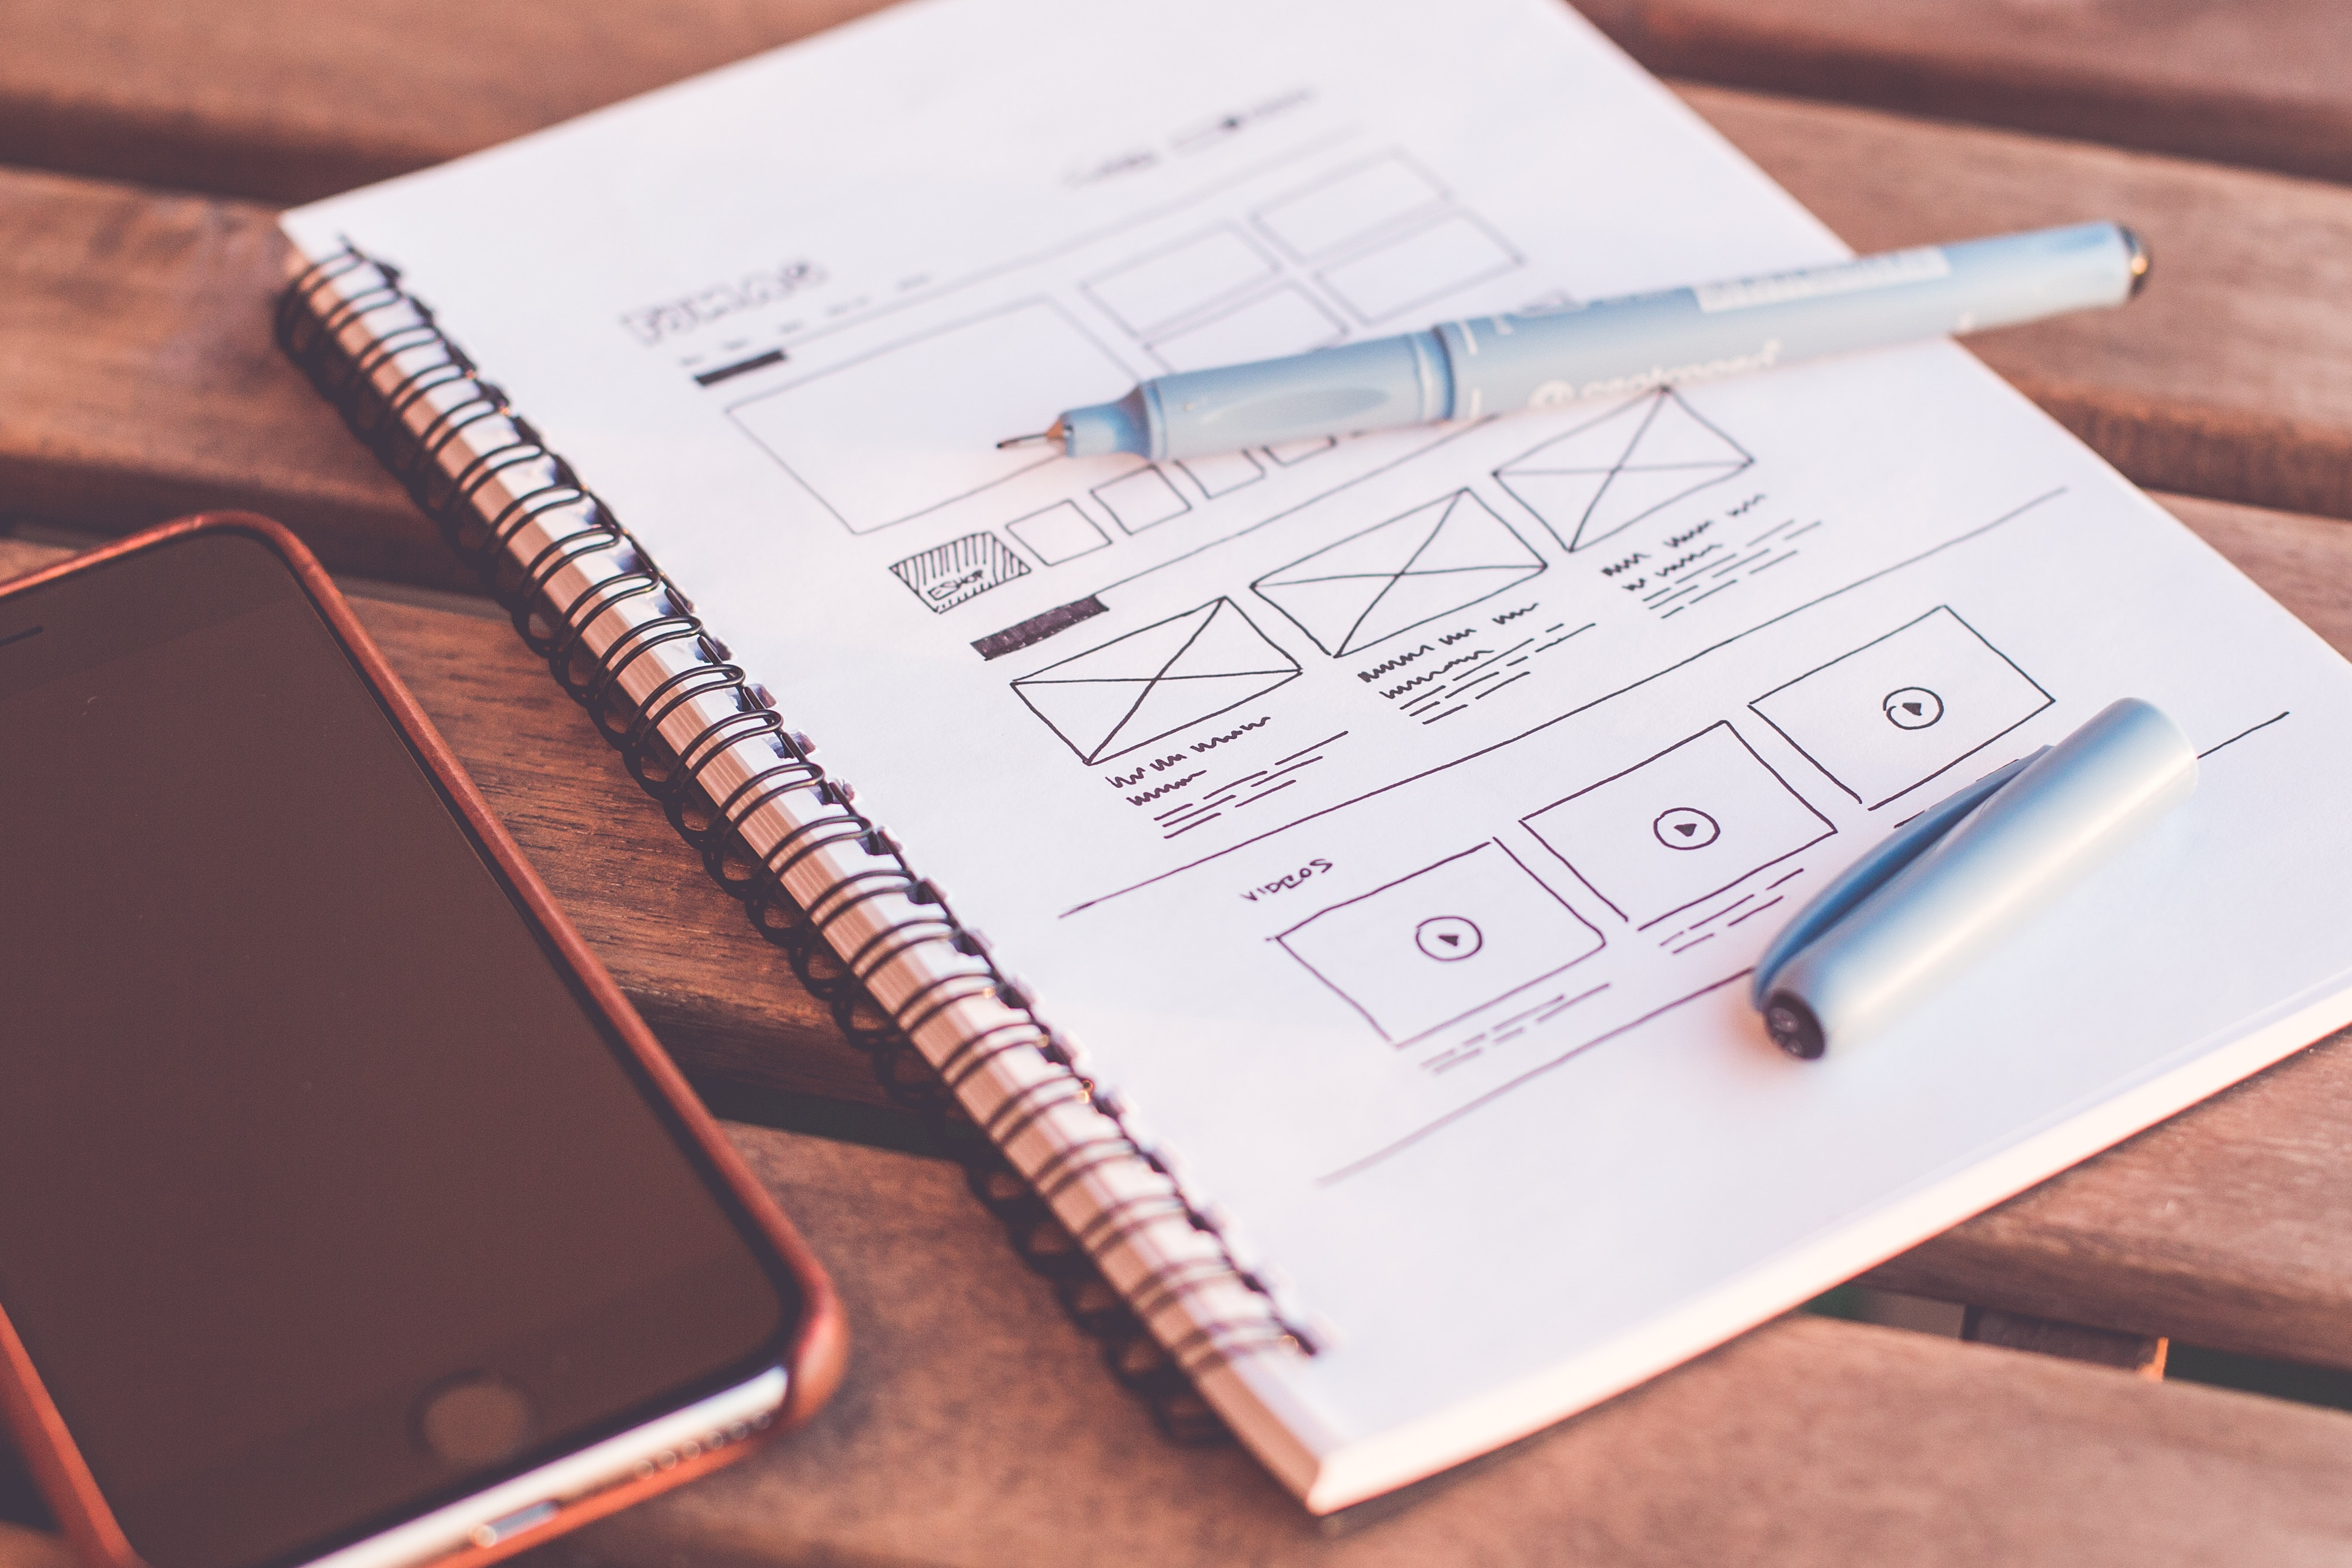 Lead User Experience Designer